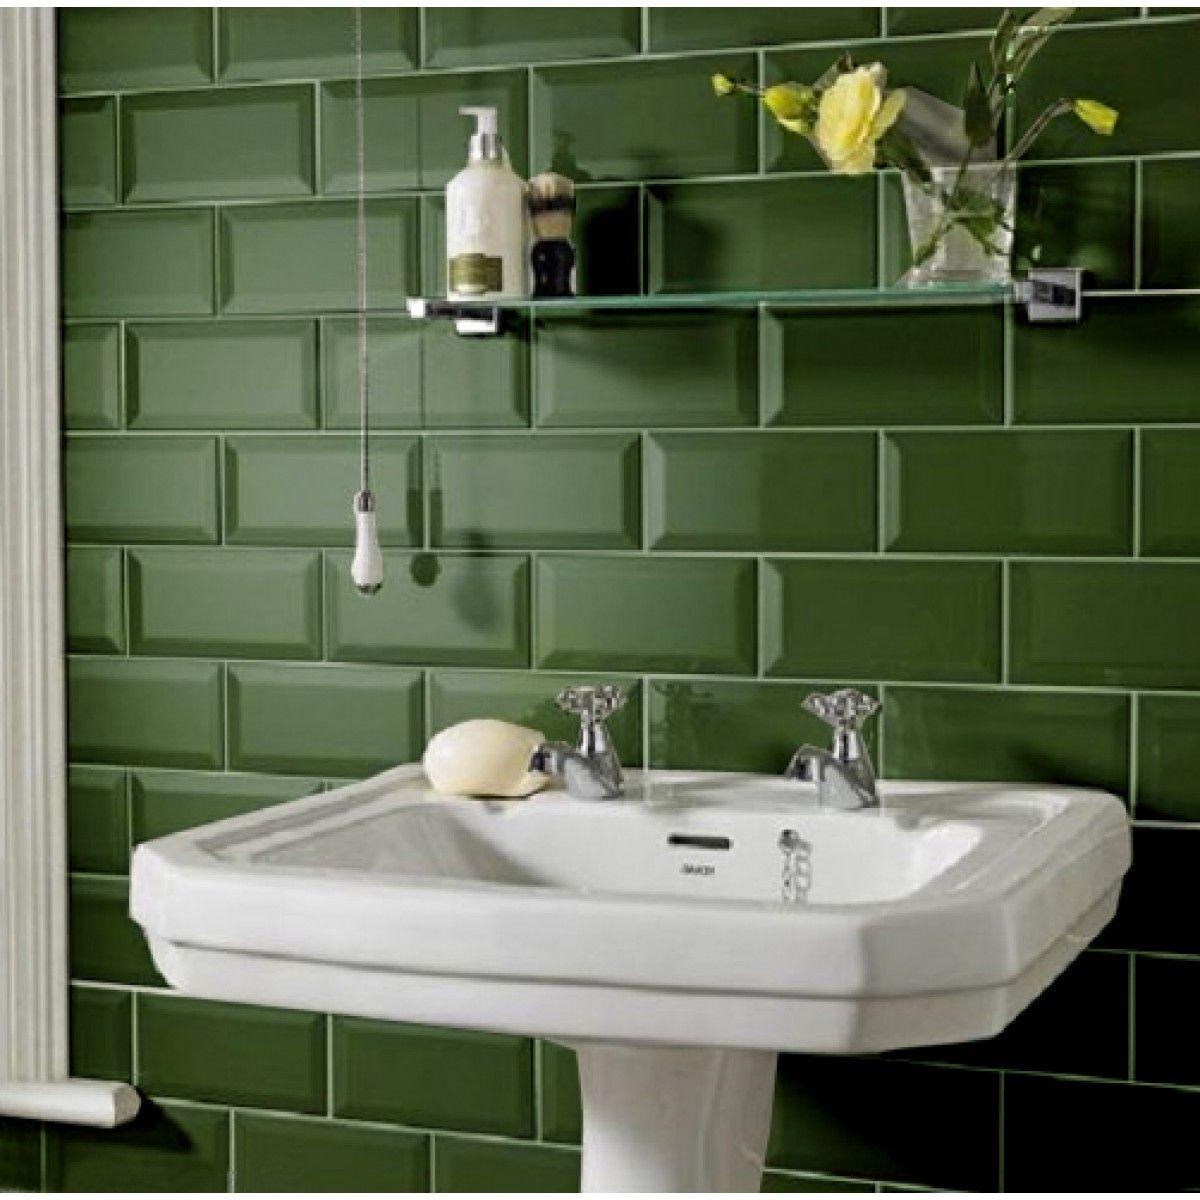 Dark Green Kitchen Ideas: Metro Tiles Bathroom, Brick Tiles Bathroom